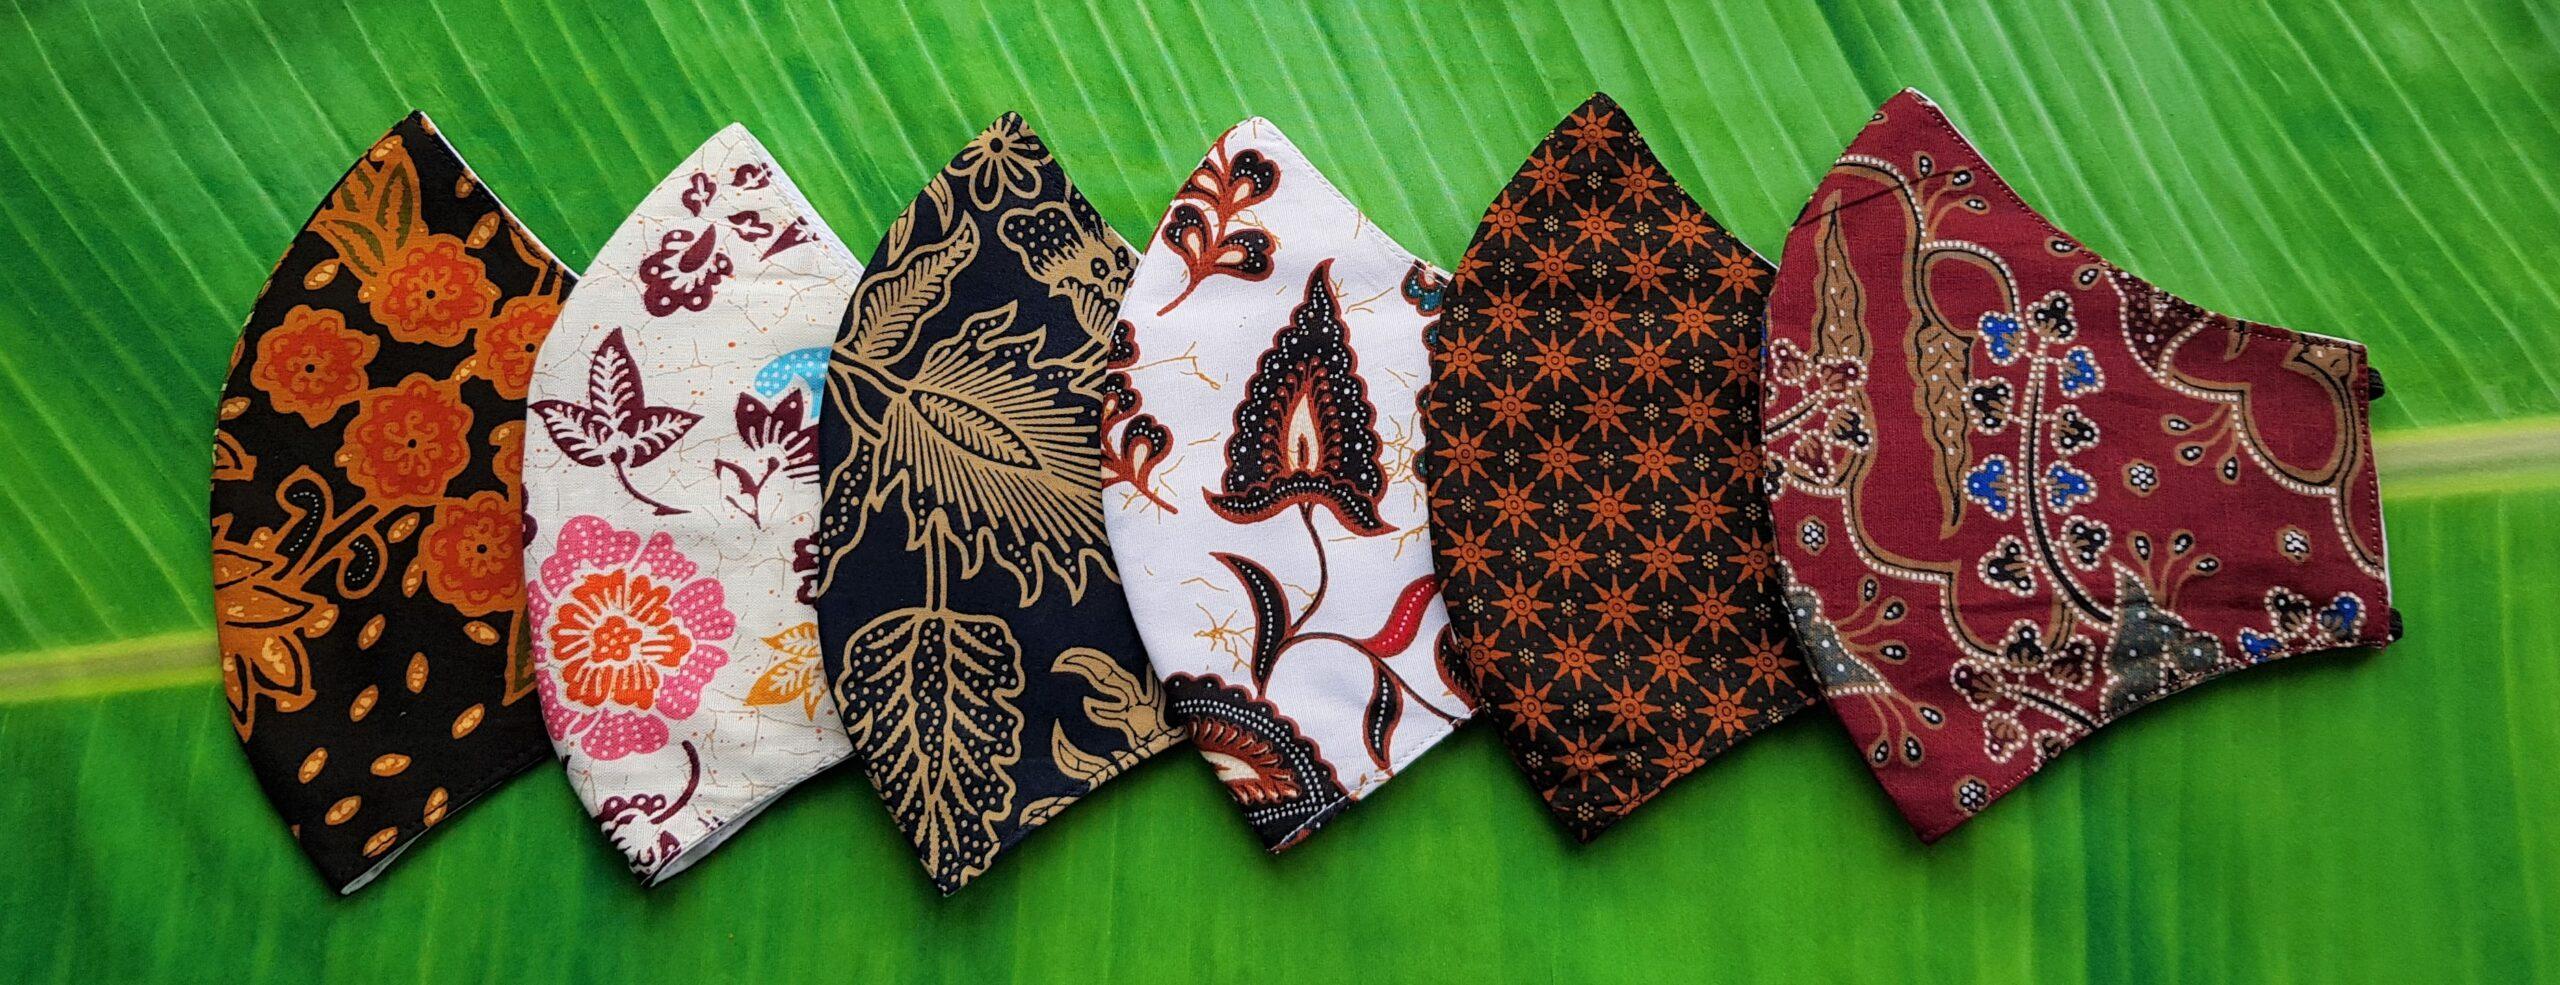 batik mondkapjes indonesie